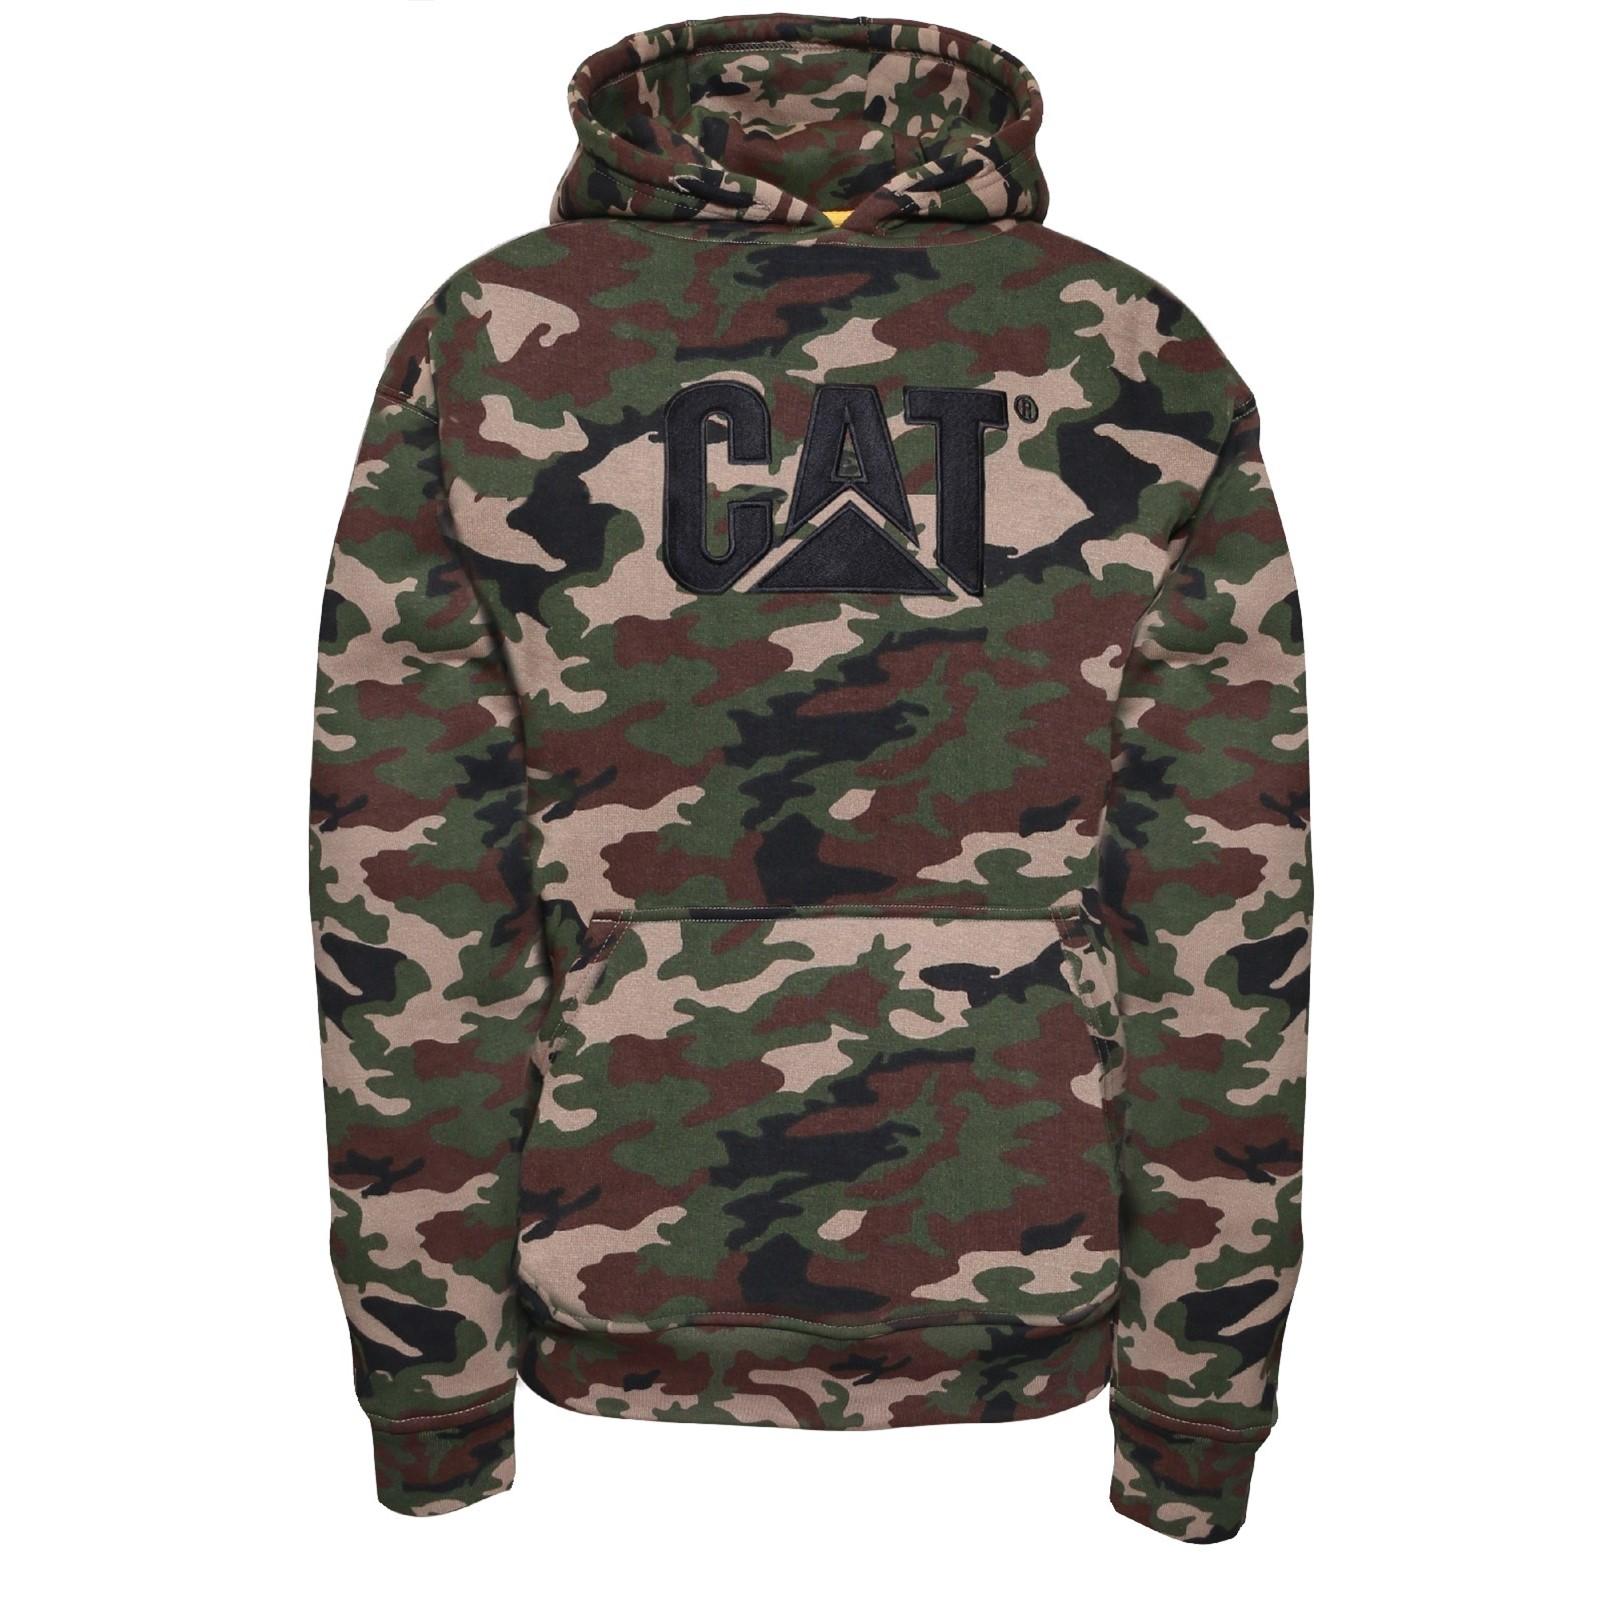 Caterpillar-Marca Pull Over Sweater con Capucha